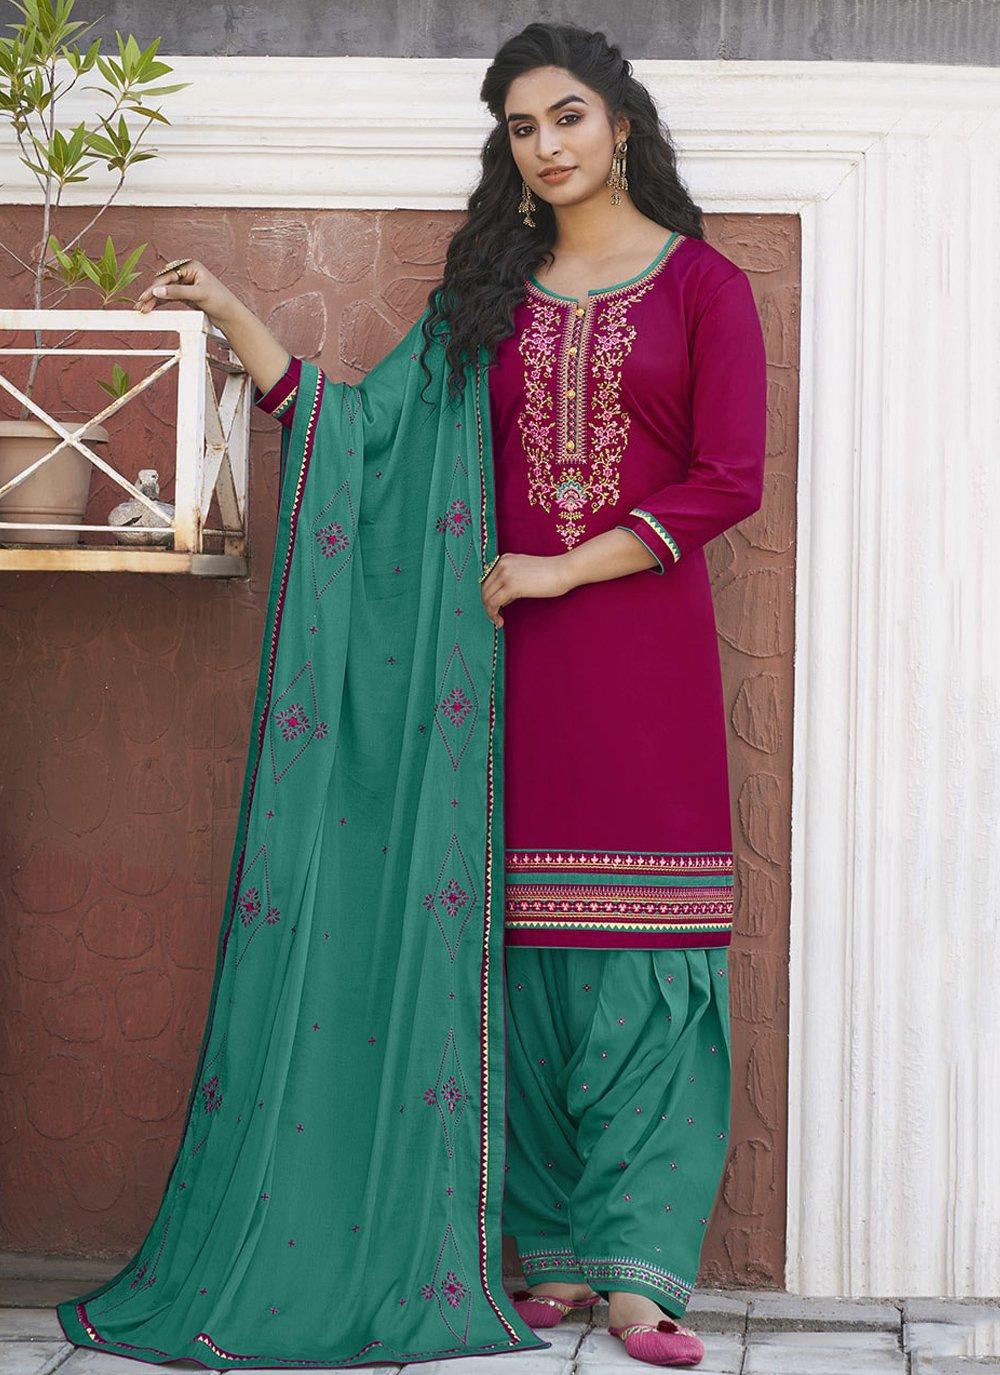 Embroidered Cotton Designer Patiala Suit